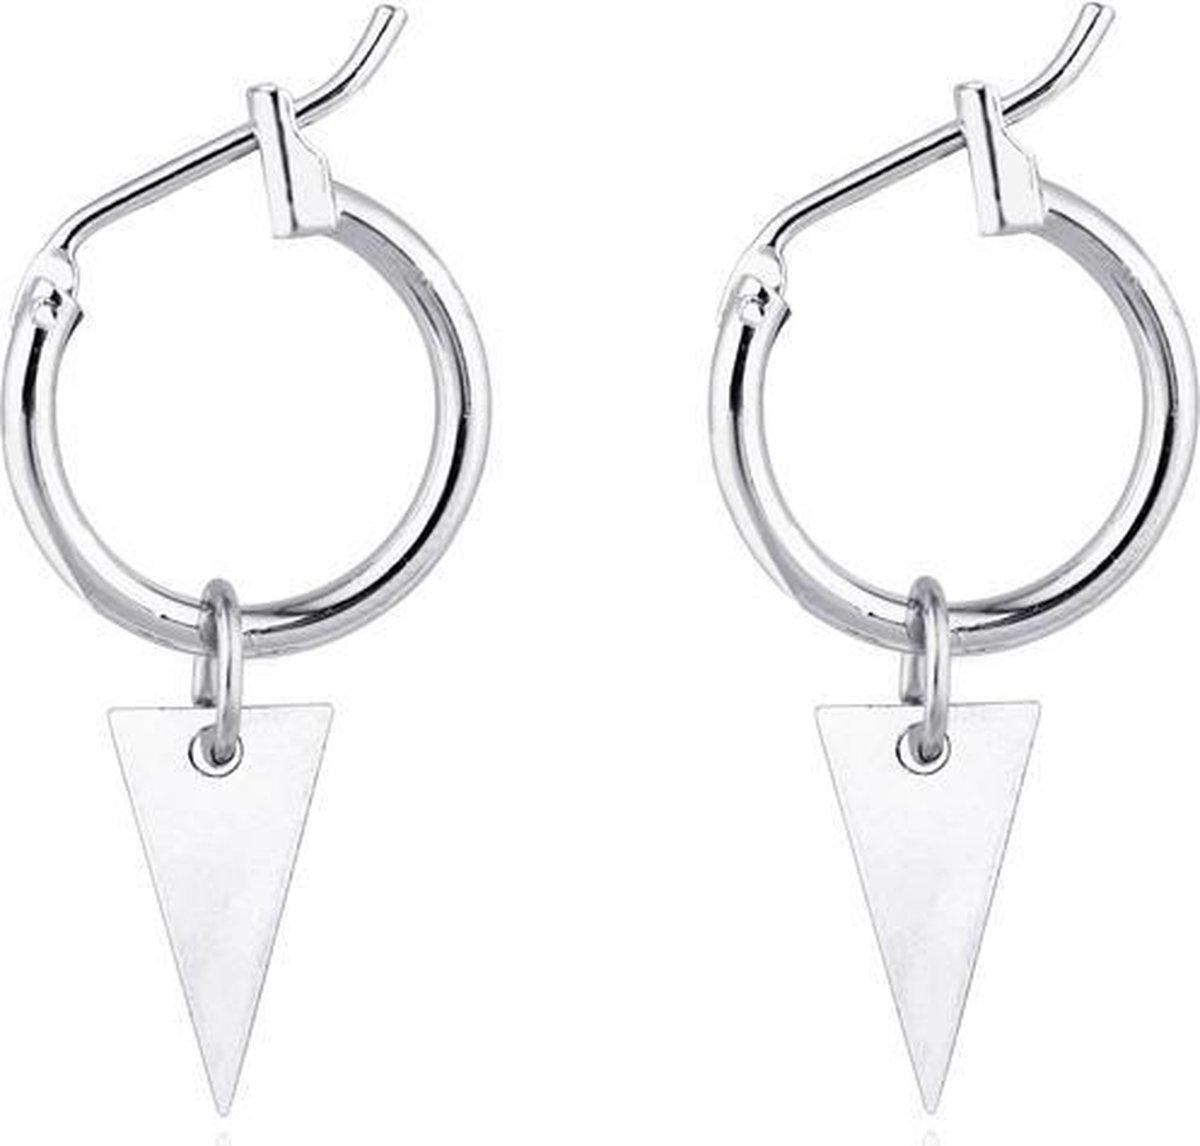 Triangle earrings - Triangle earring - Driehoek oorbellen - Zilver - Merkloos